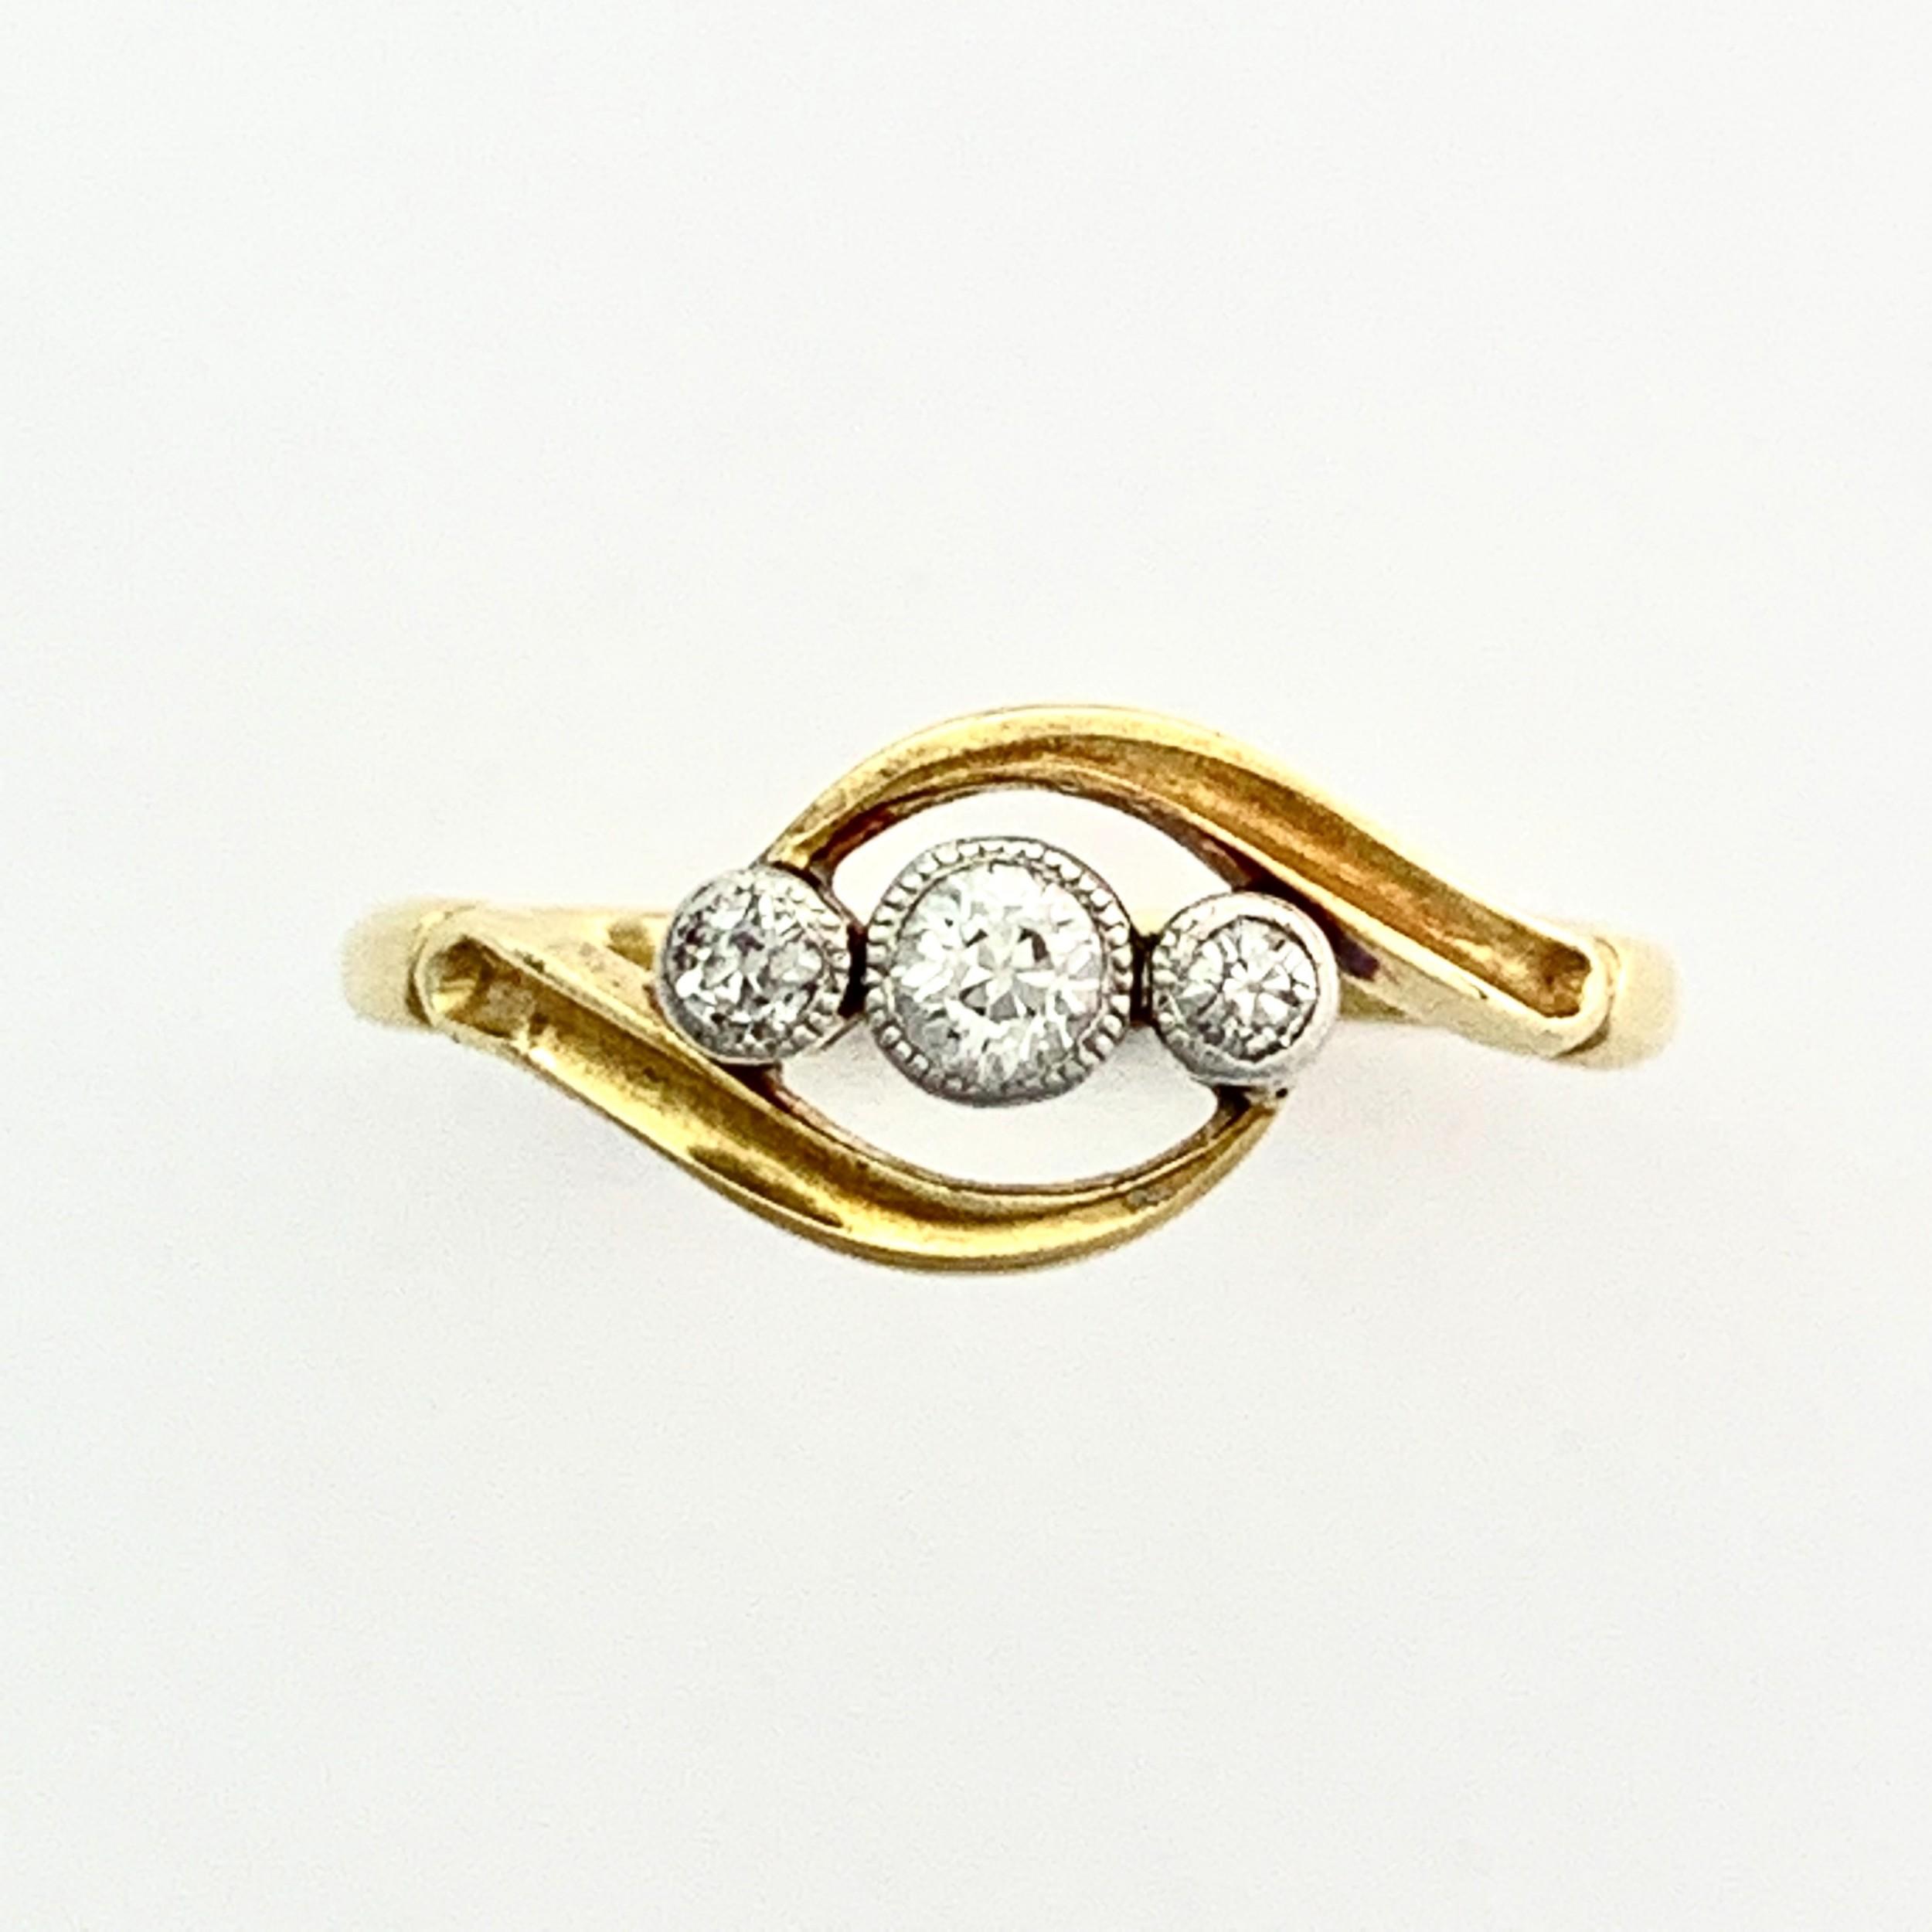 edwardian 18ct gold threestone diamond ring